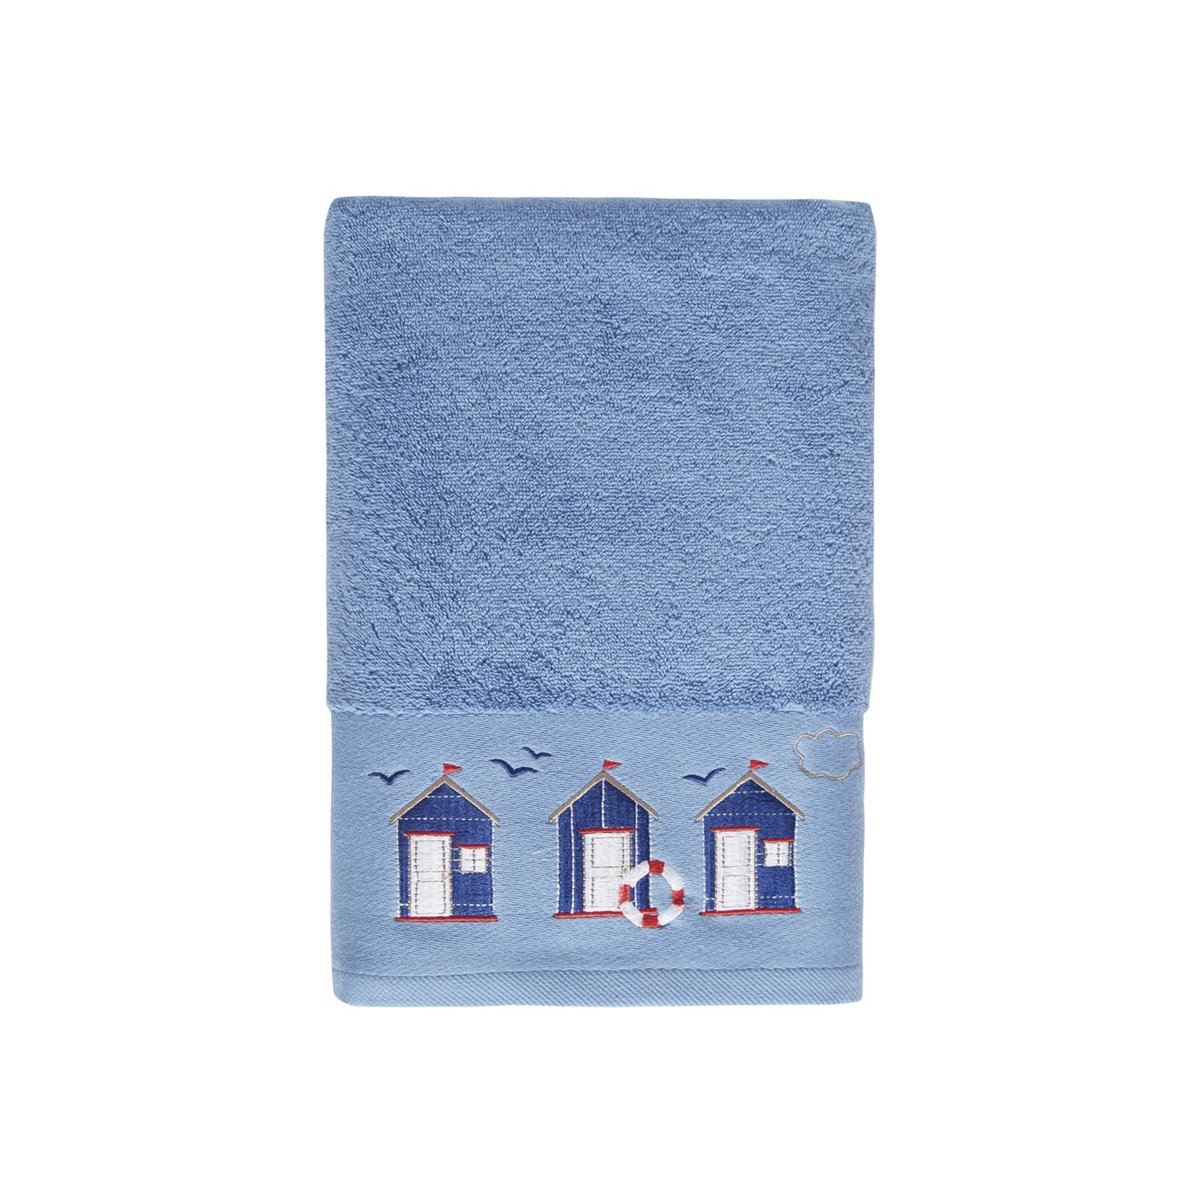 Drap de bain cabine 21 Blanc 70x140 cm